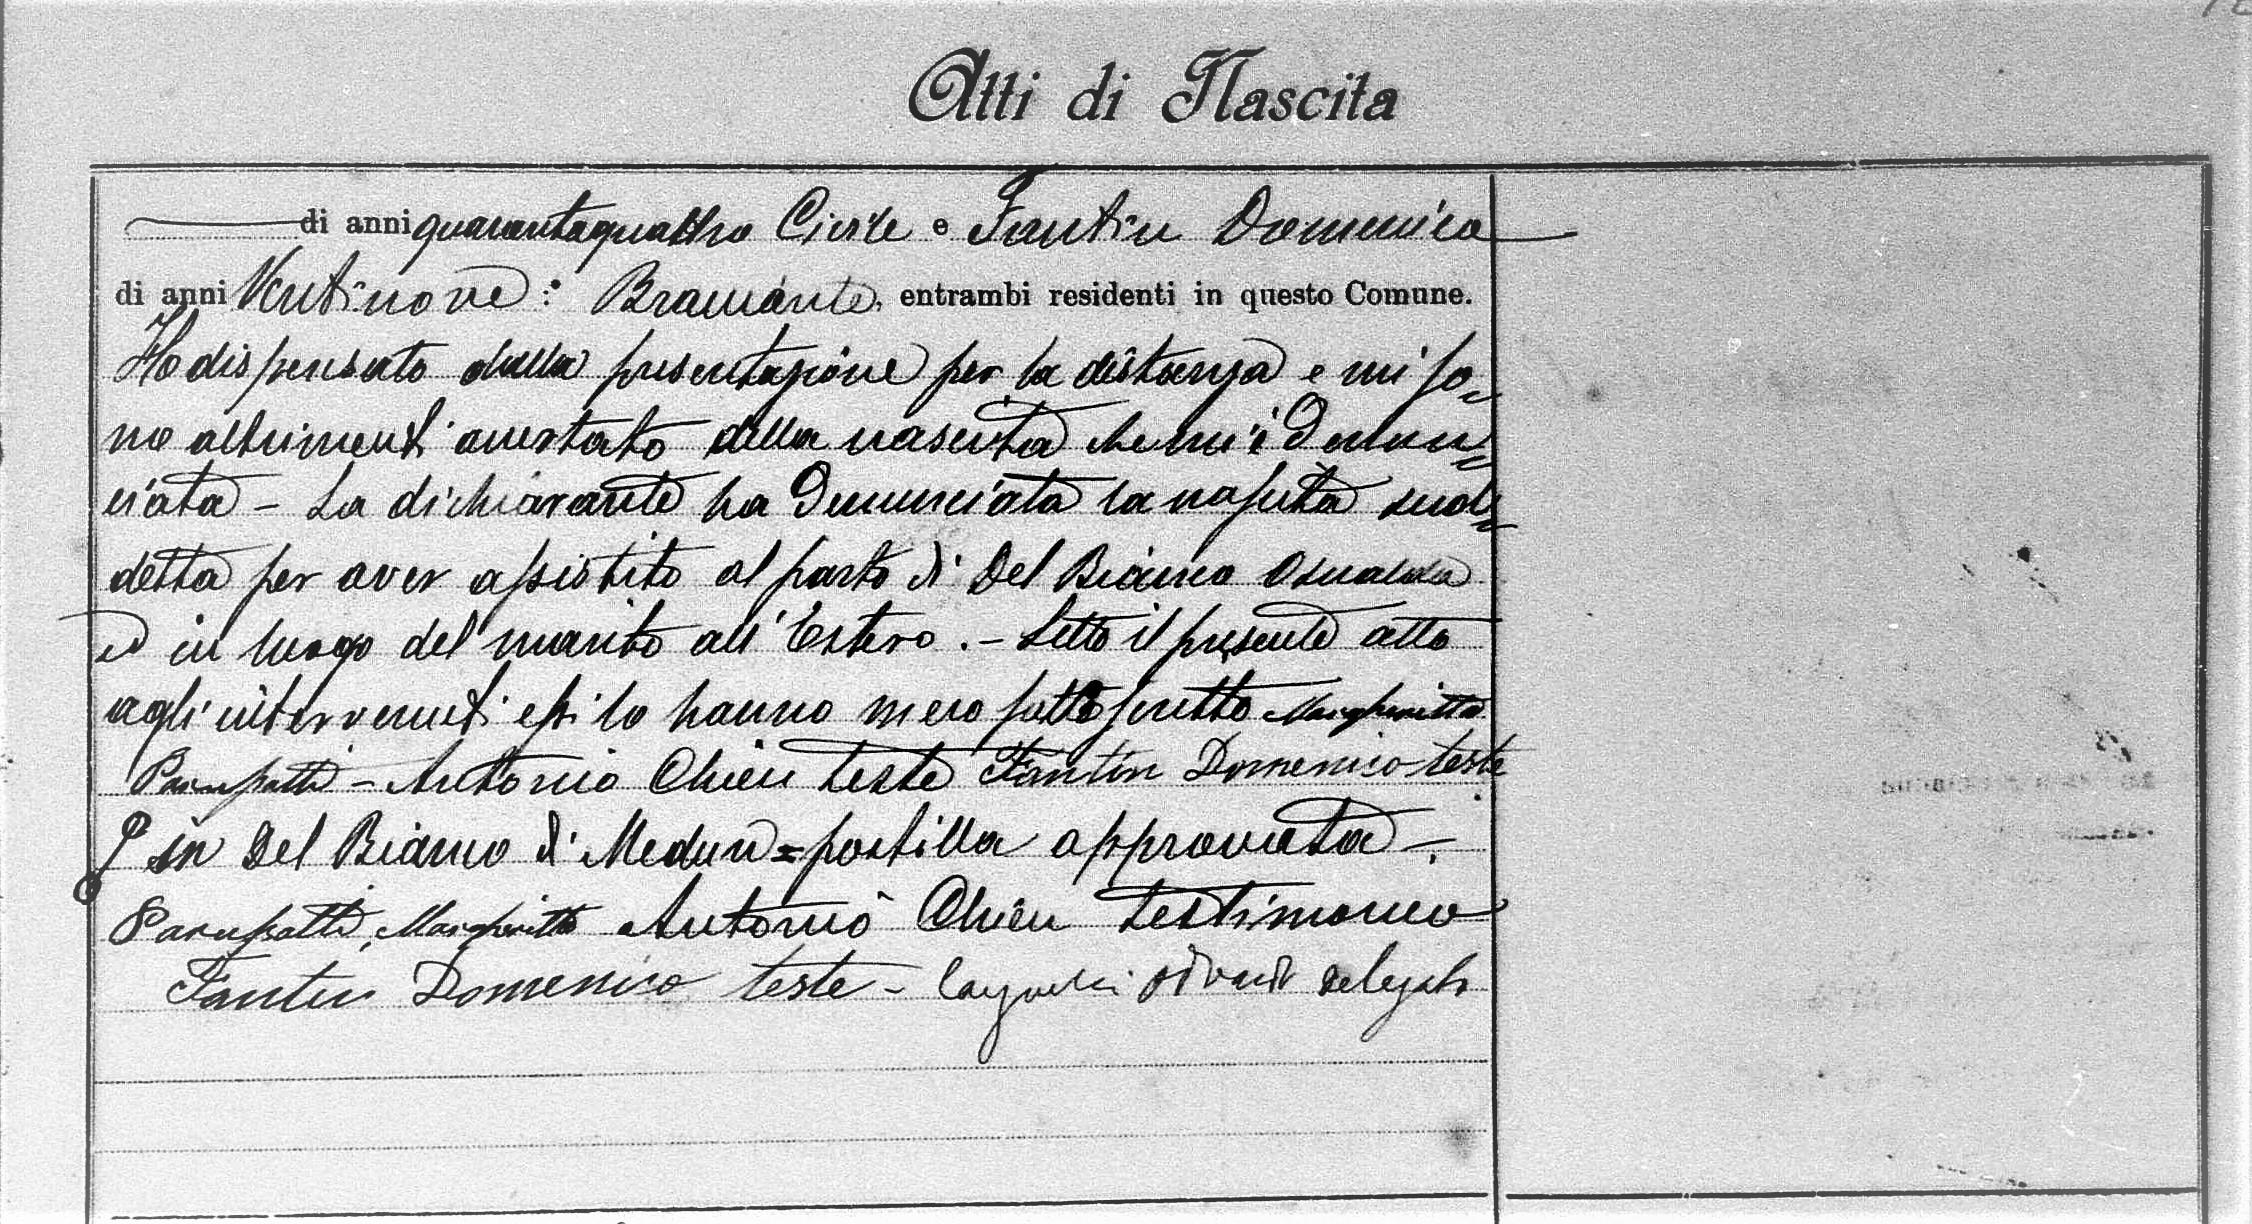 http://www.genealogiafamiliare.it/wp/wp-content/uploads/2018/03/Nascita-Luigi2.jpg